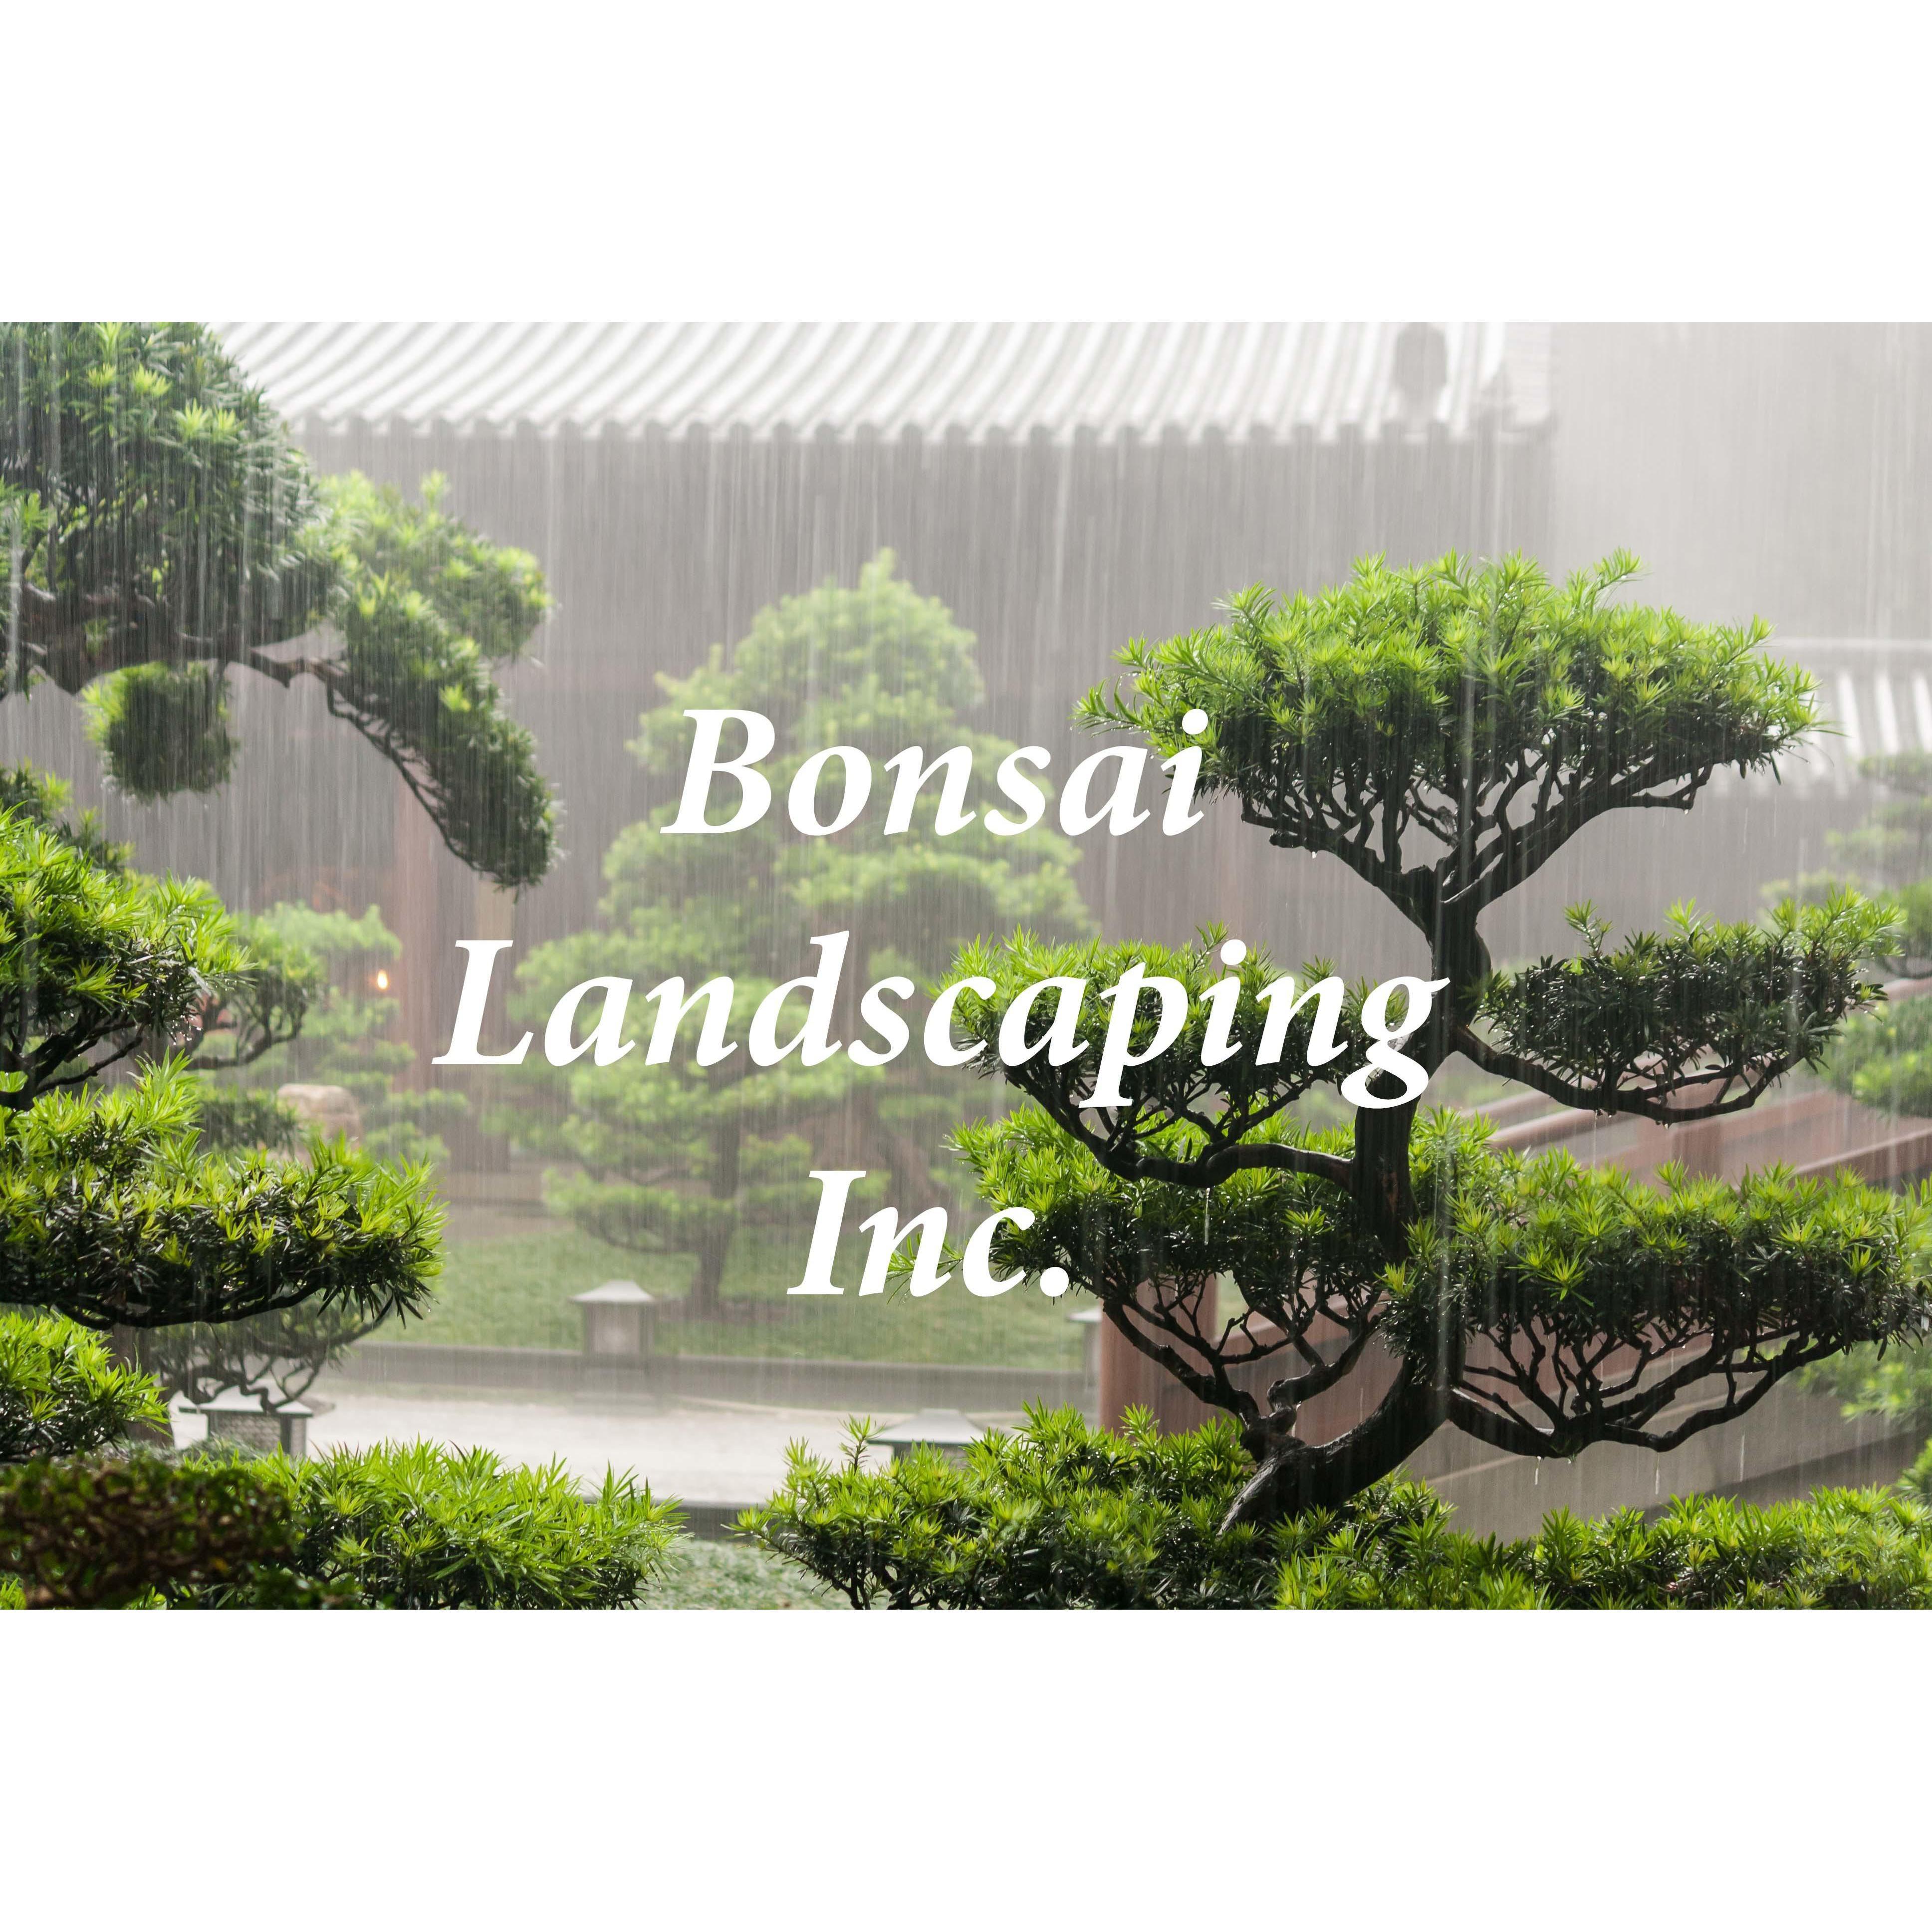 Bonsai Landscaping Inc. - Bonita Springs, FL 34135 - (239)250-4080 | ShowMeLocal.com